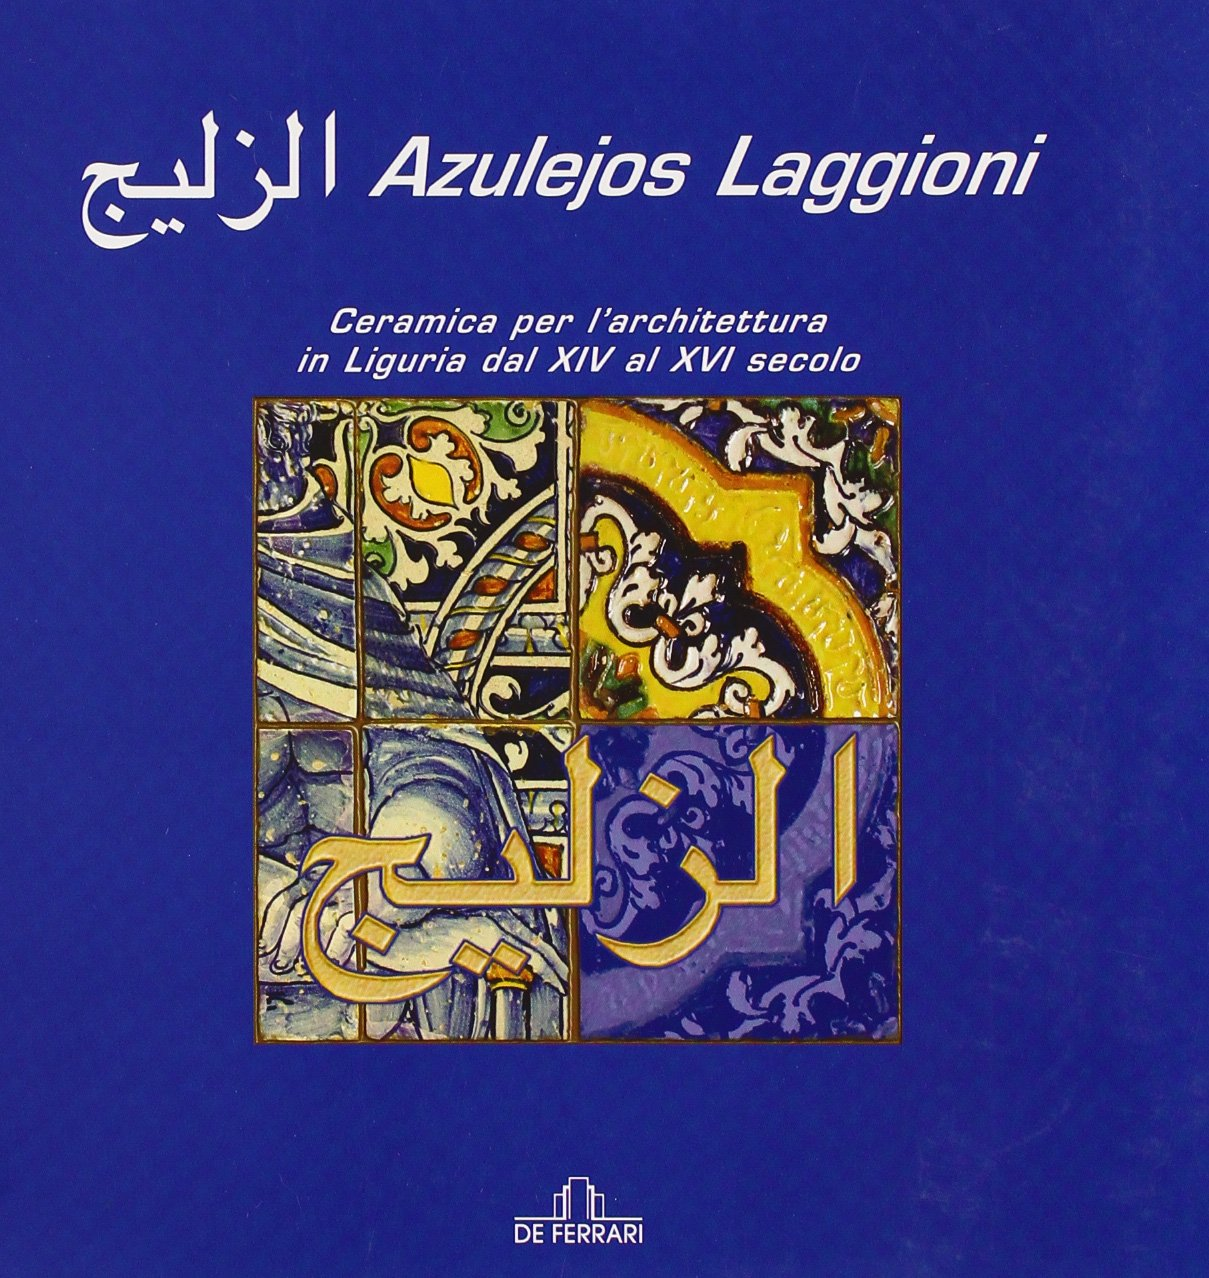 Azulejos Laggioni